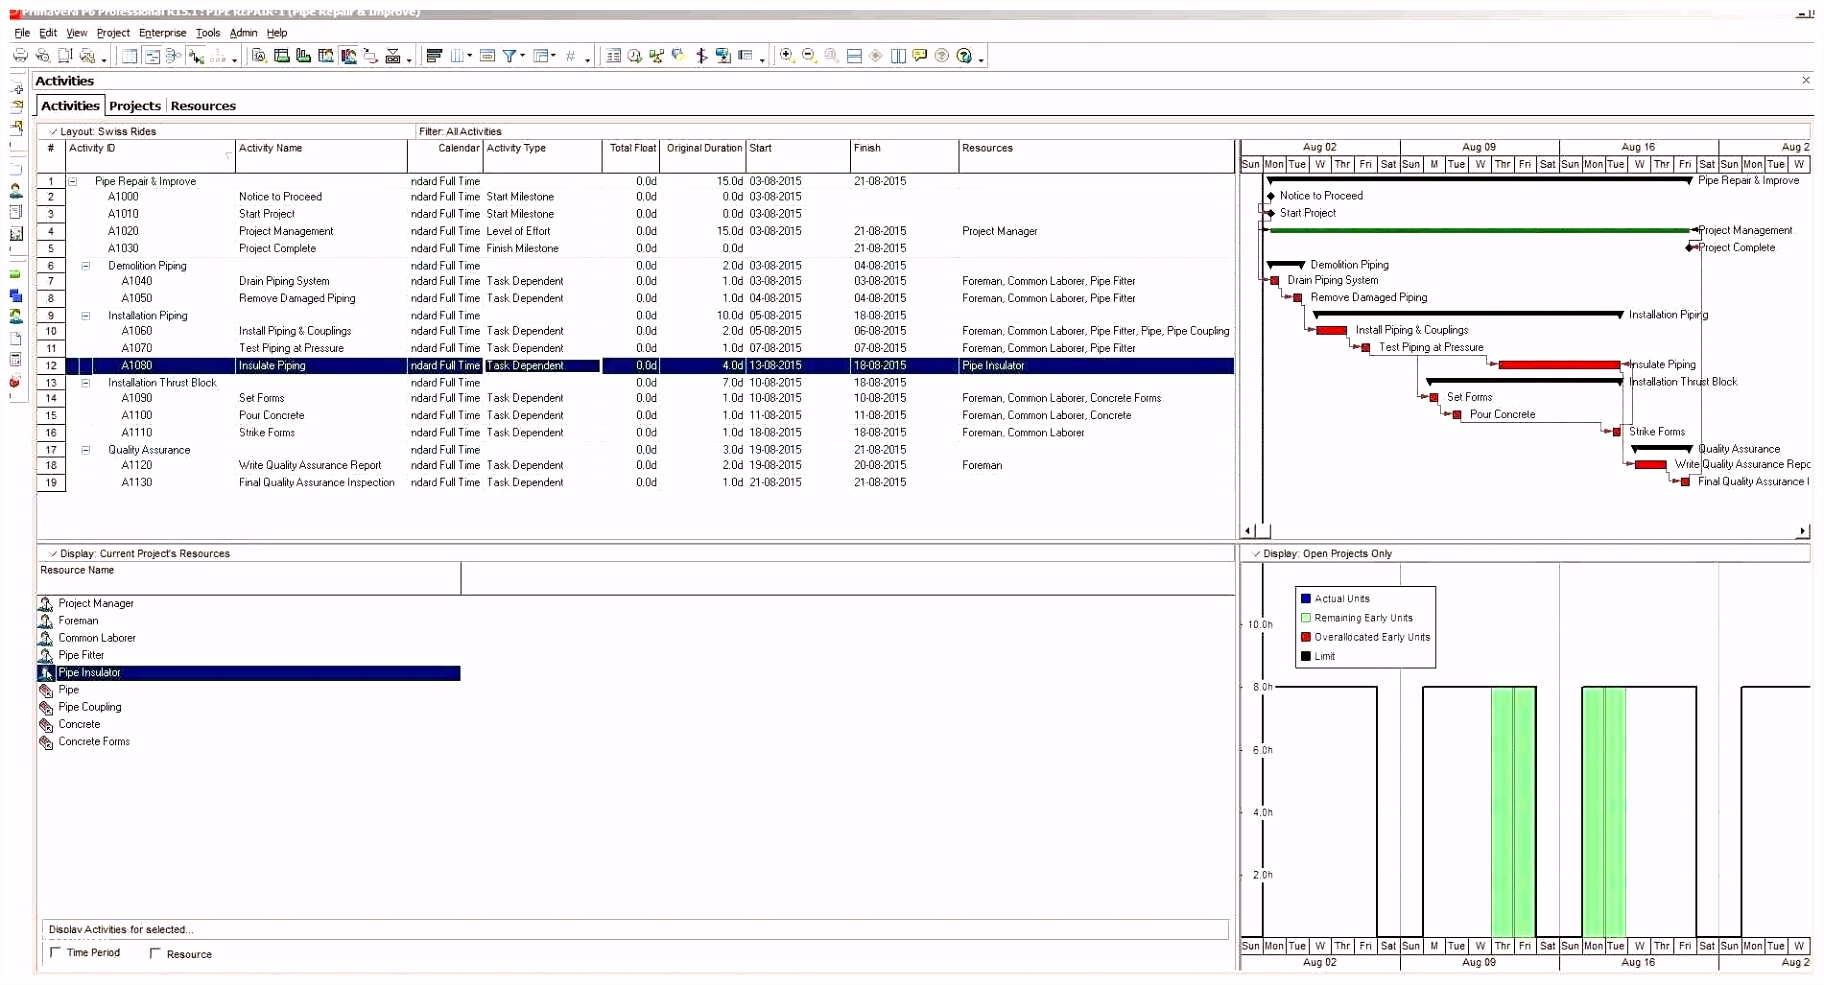 Microsoft Publisher Vorlagen Free Microsoft Publisher Templates Fice for Excel Elegant Ms Fice S3nd44okh5 D4uv52xcis